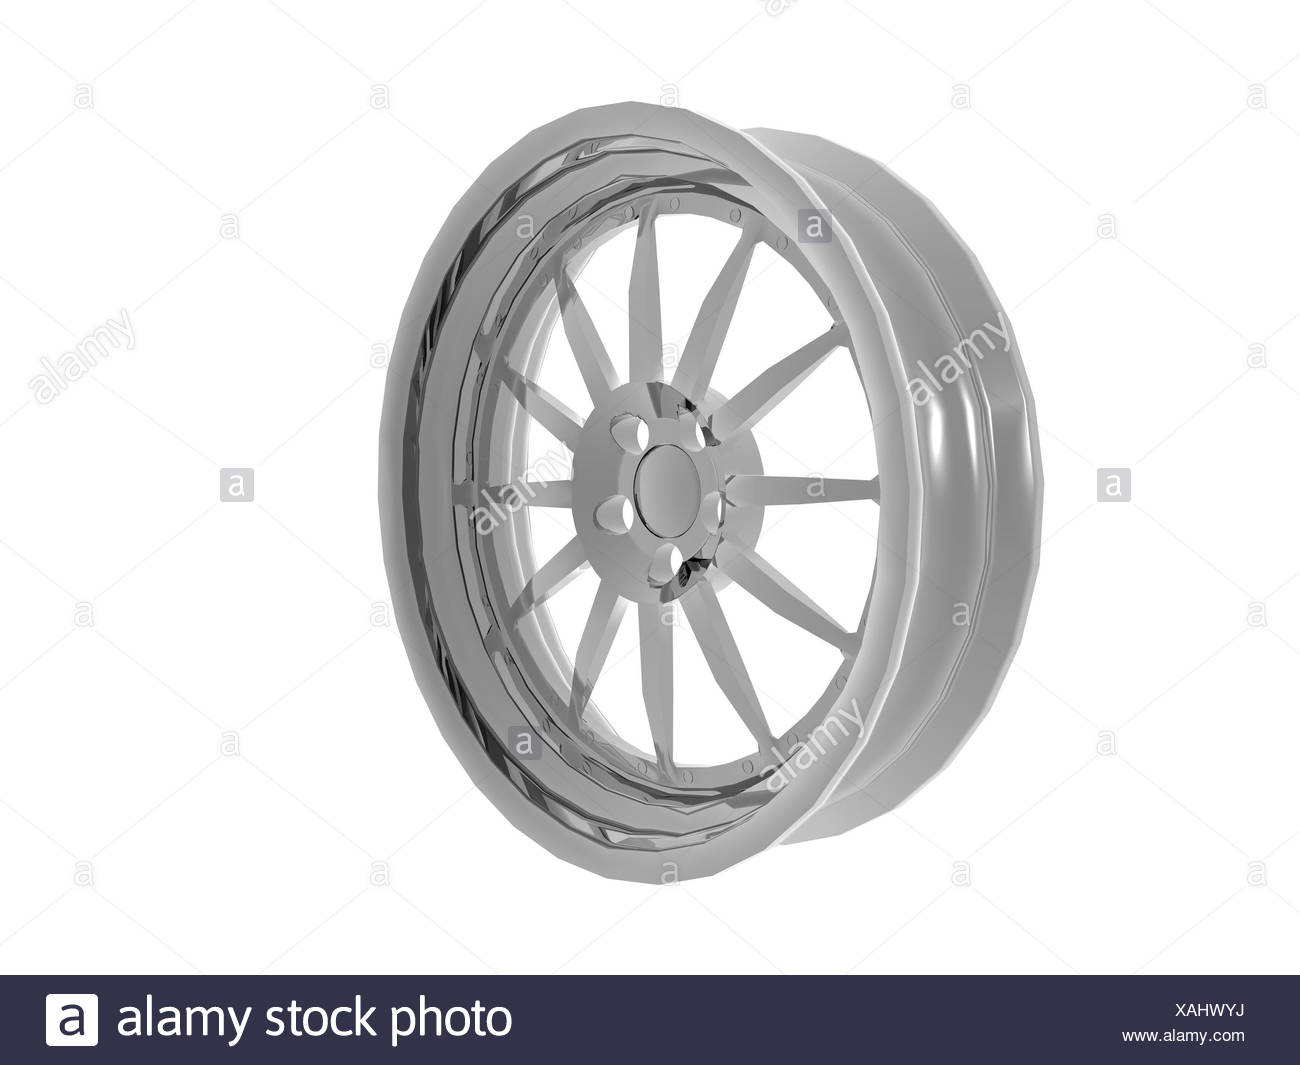 optional aluminum rims - Stock Image